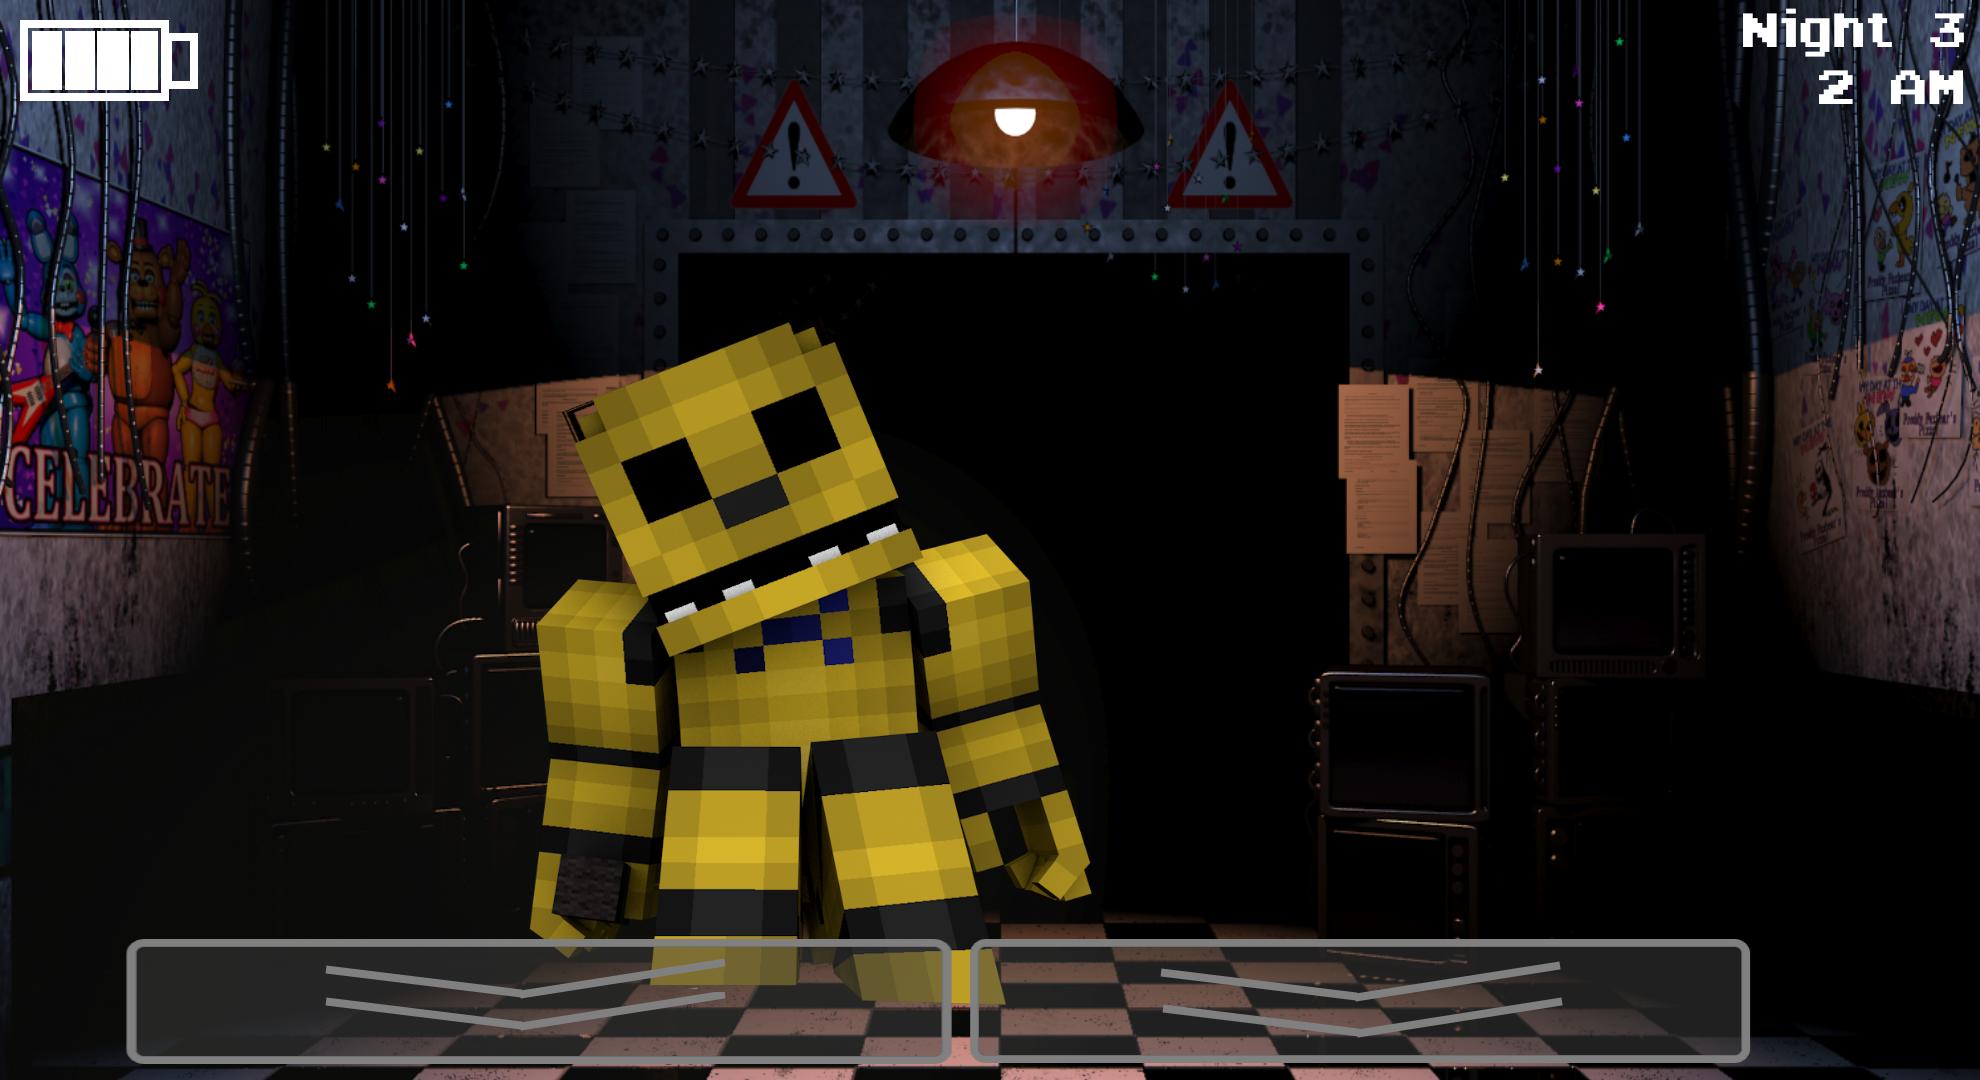 Minecraft Golden Freddy Wallpaper by GalaxyPlays 1980x1080